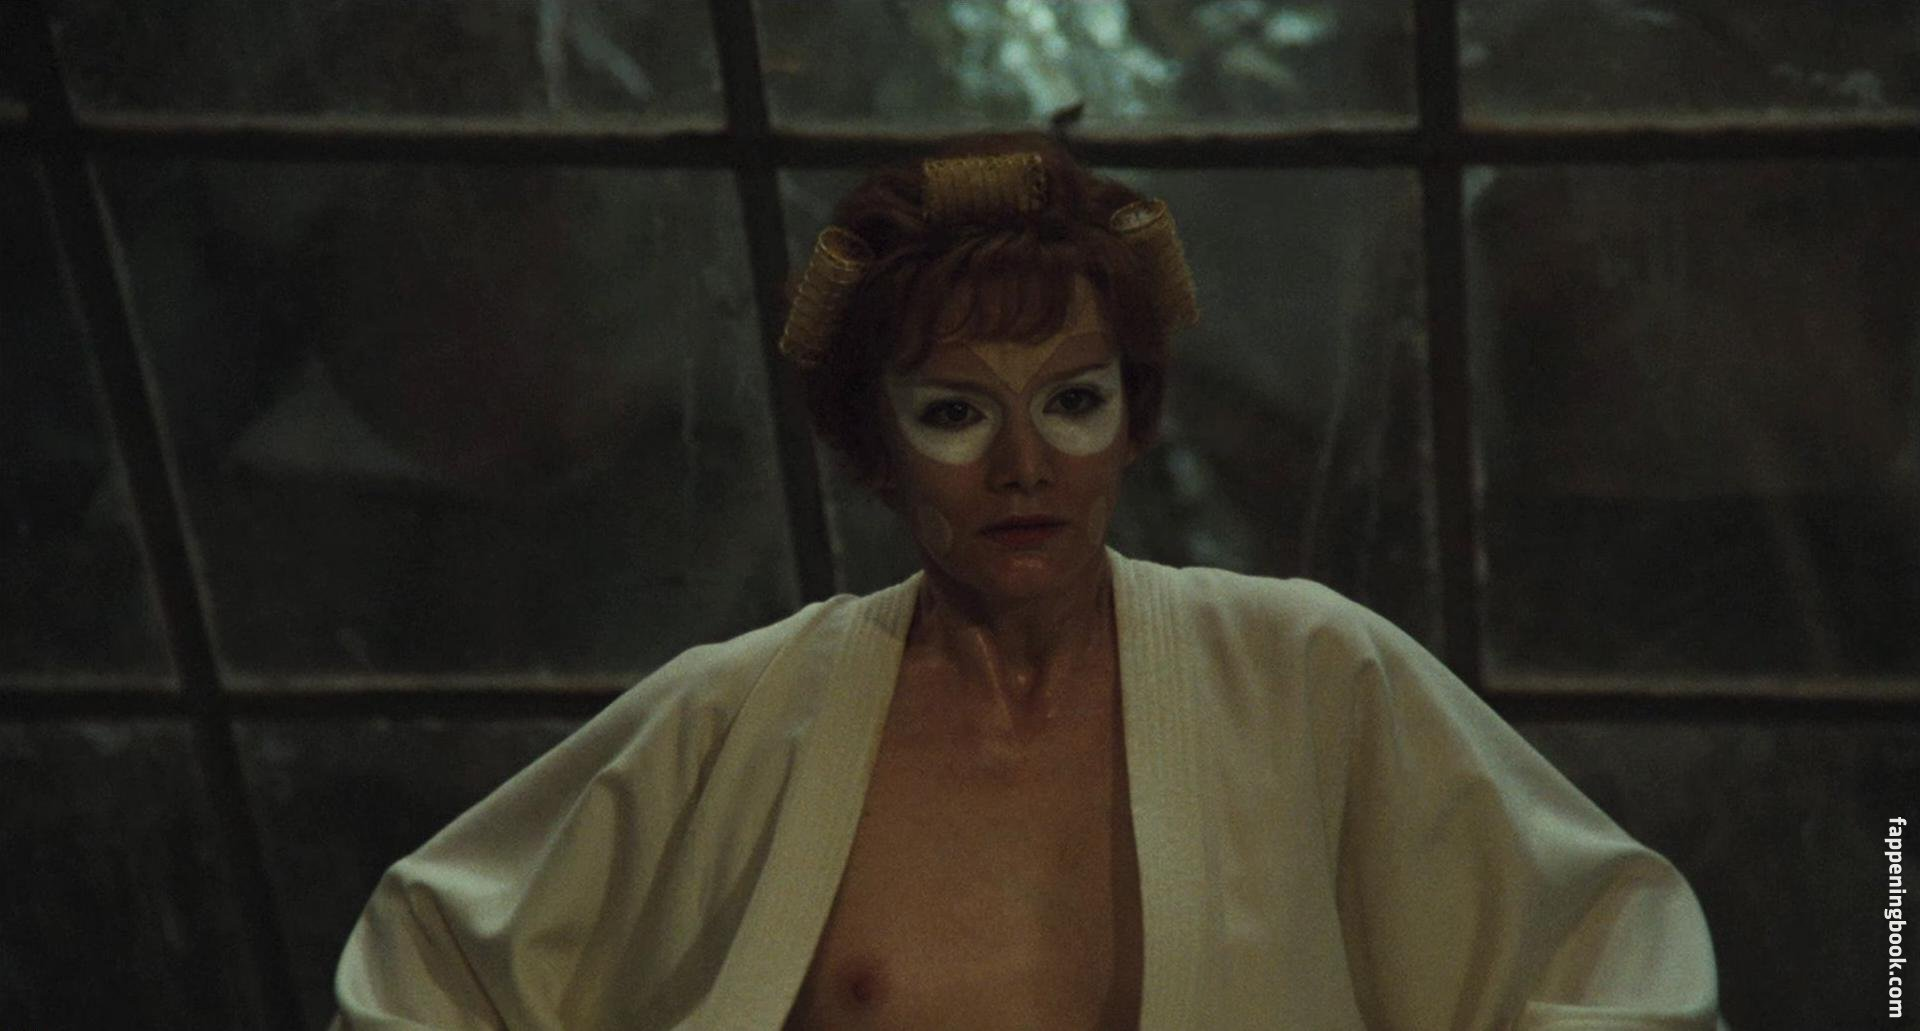 Jilian nackt Starfighter Carrie Prejean: